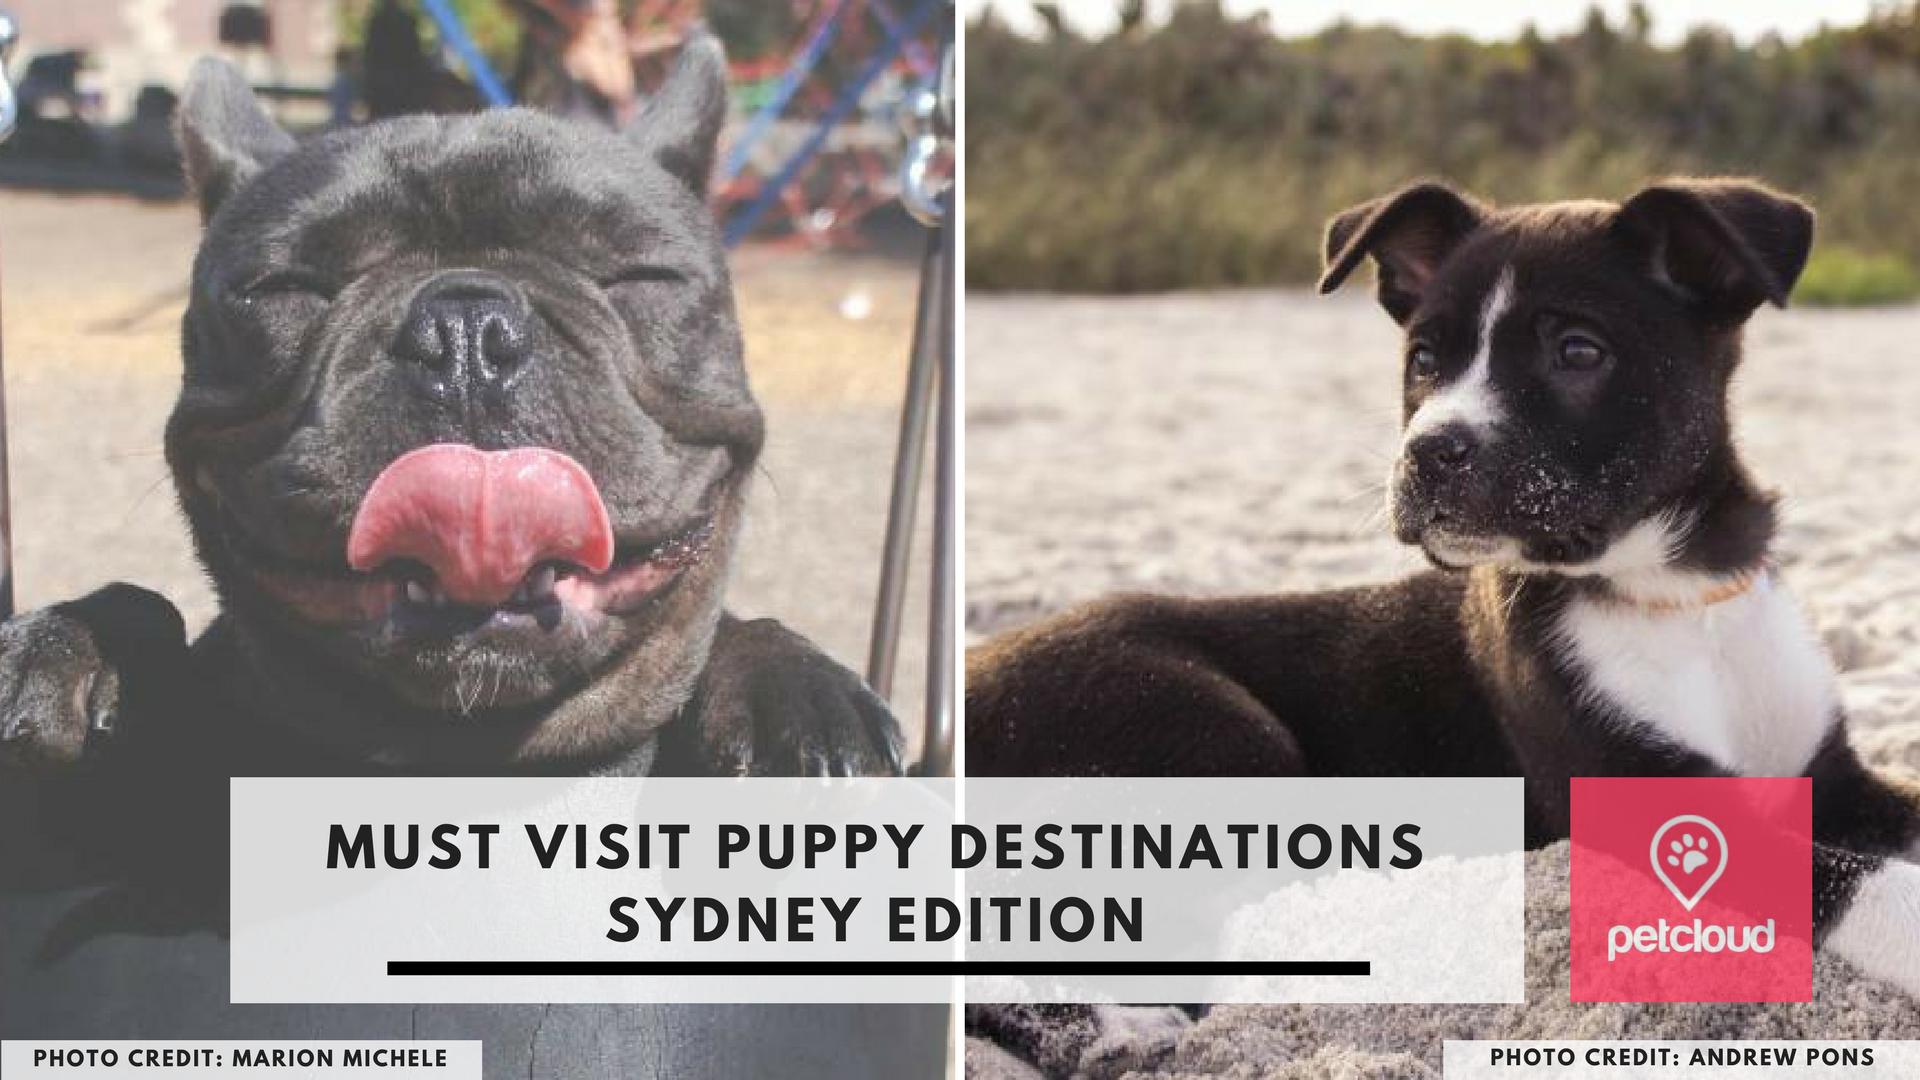 Must Visit Puppy Destinations: Sydney Edition